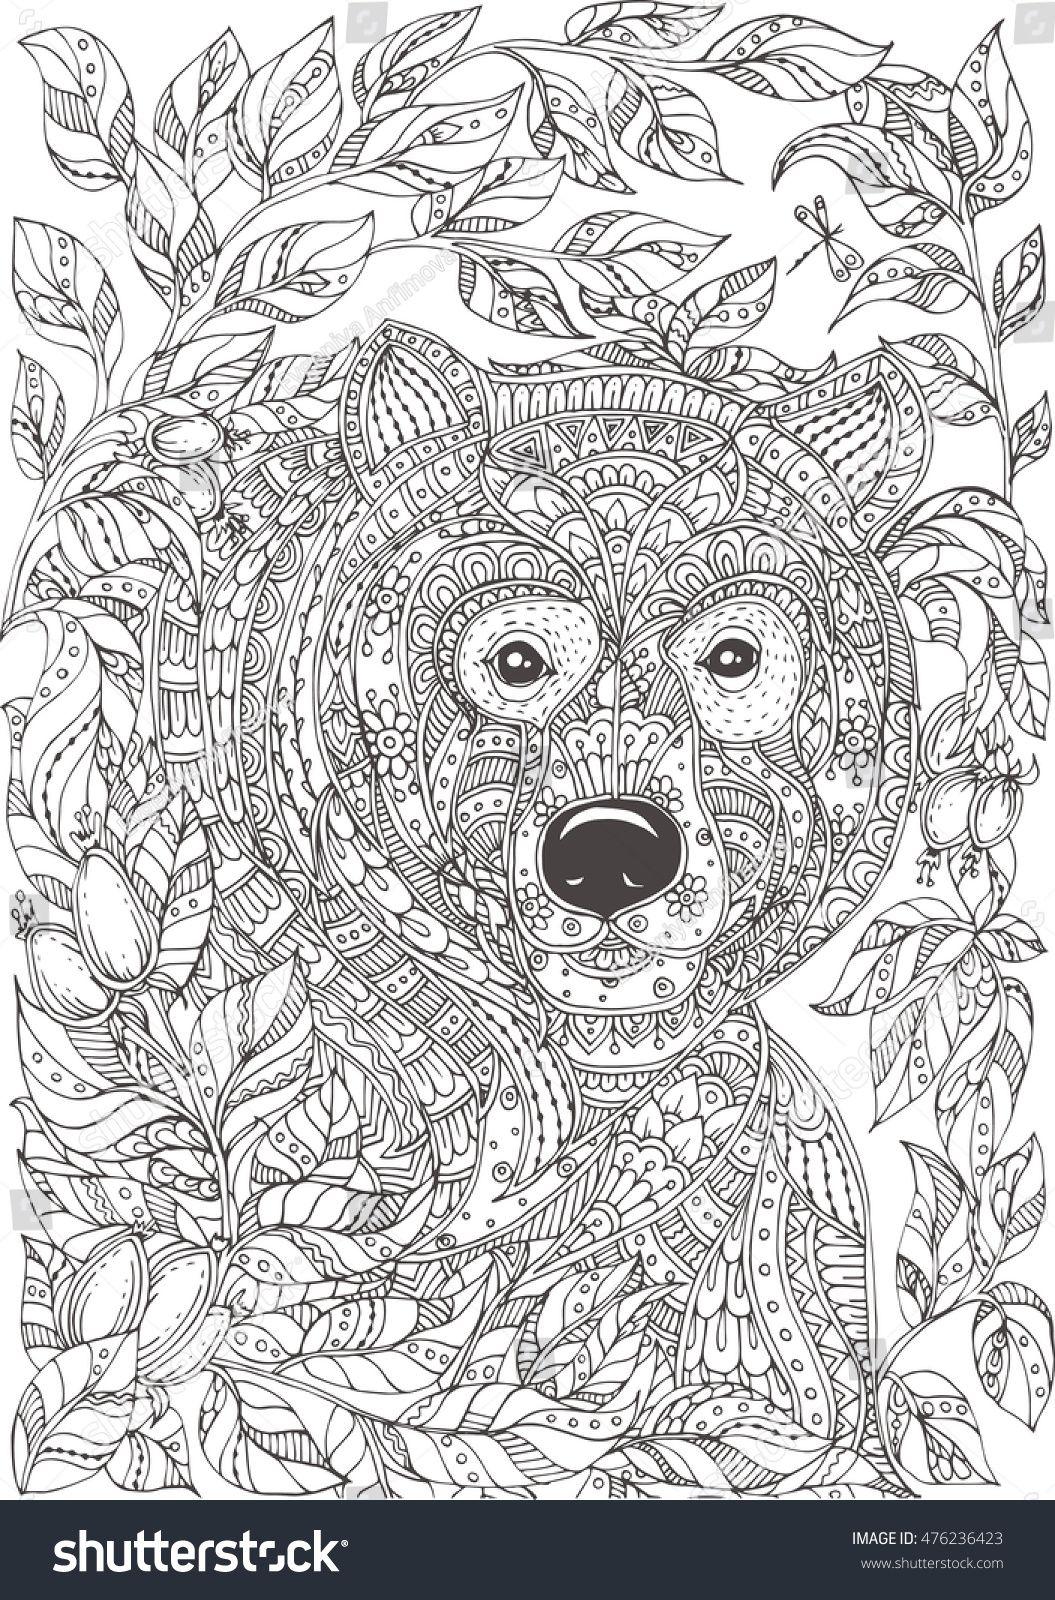 Coloring Pages Animal Florl D Photo Album - Sabadaphnecottage